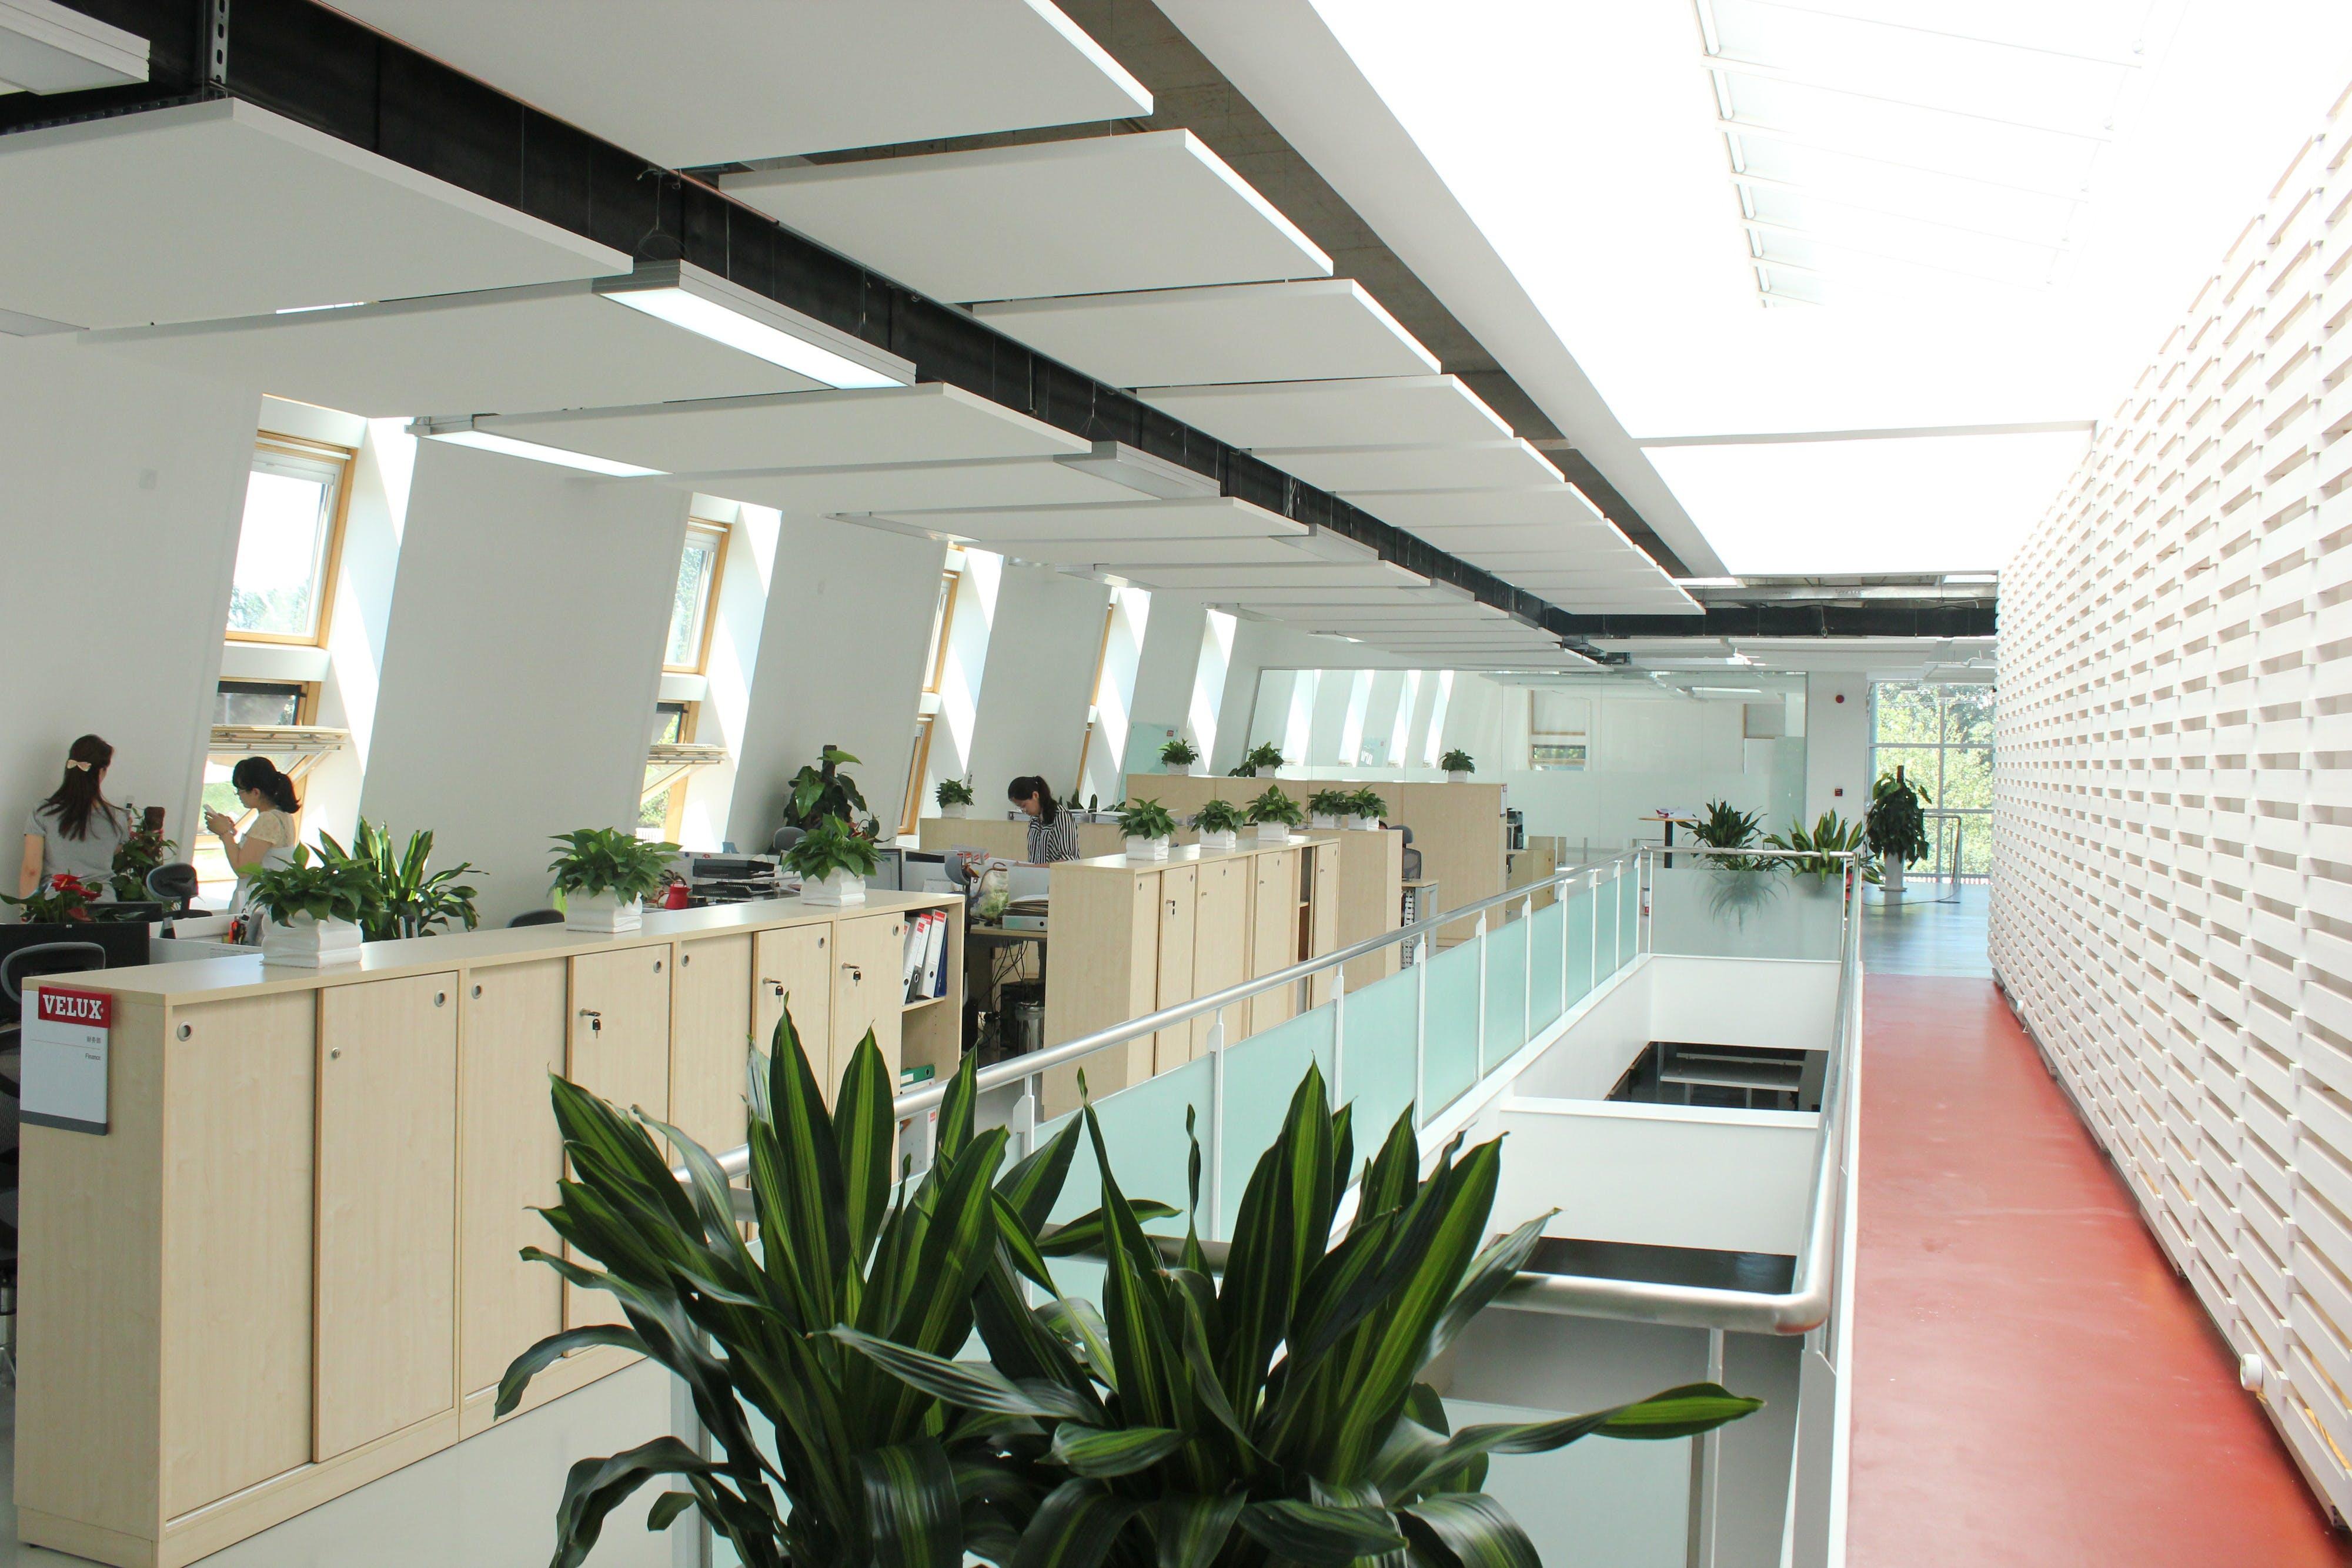 CN Velux Office, Rockfon Eclipse, 2013